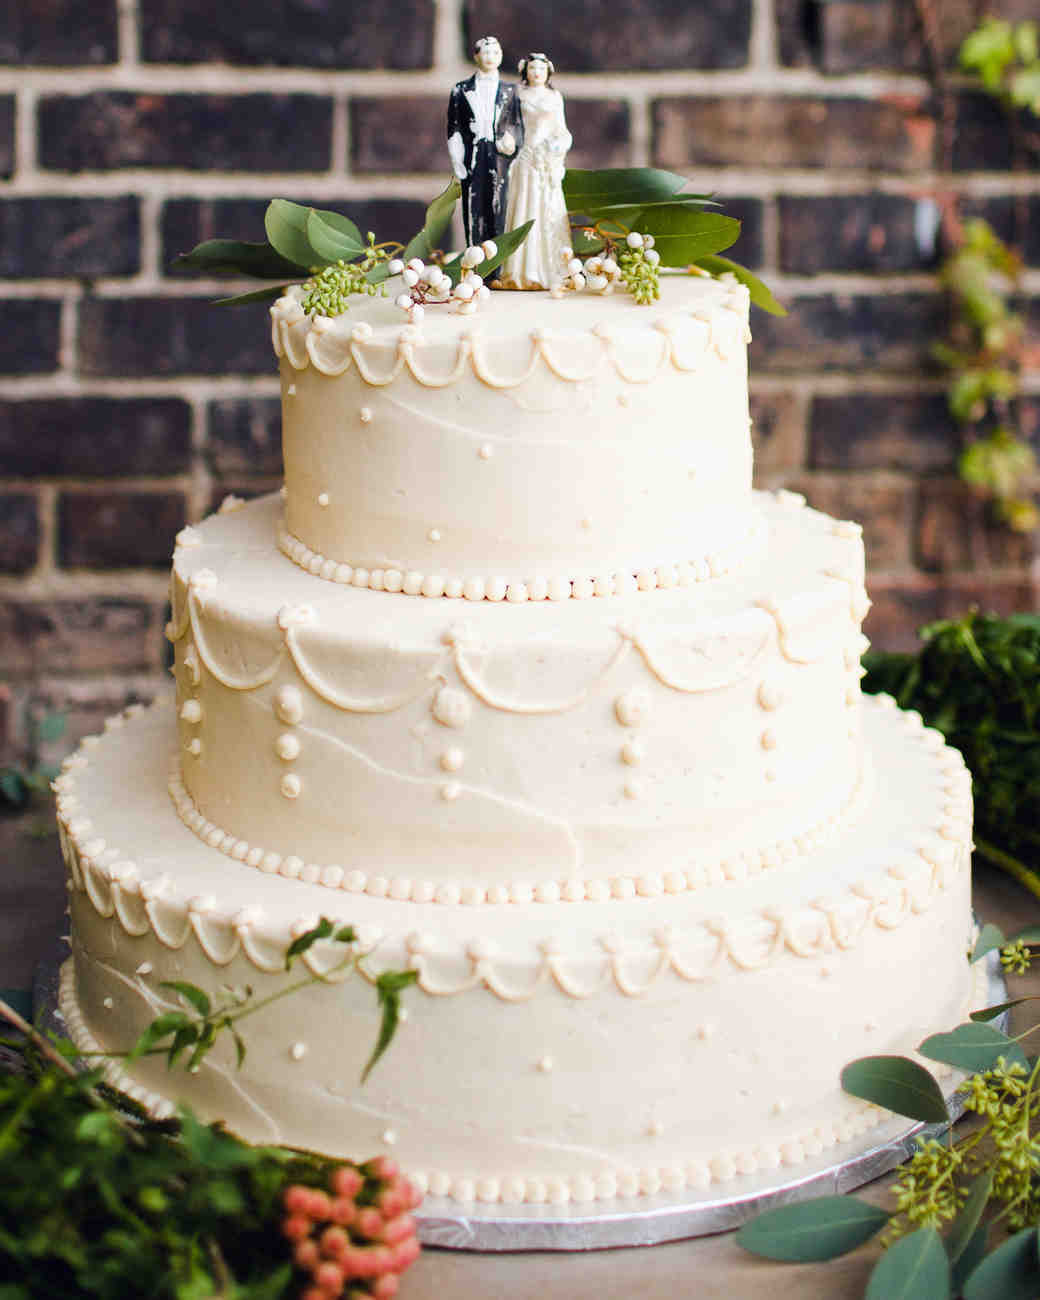 Wedding Cakes Vintage  29 Wedding Cakes with Vintage Vibes